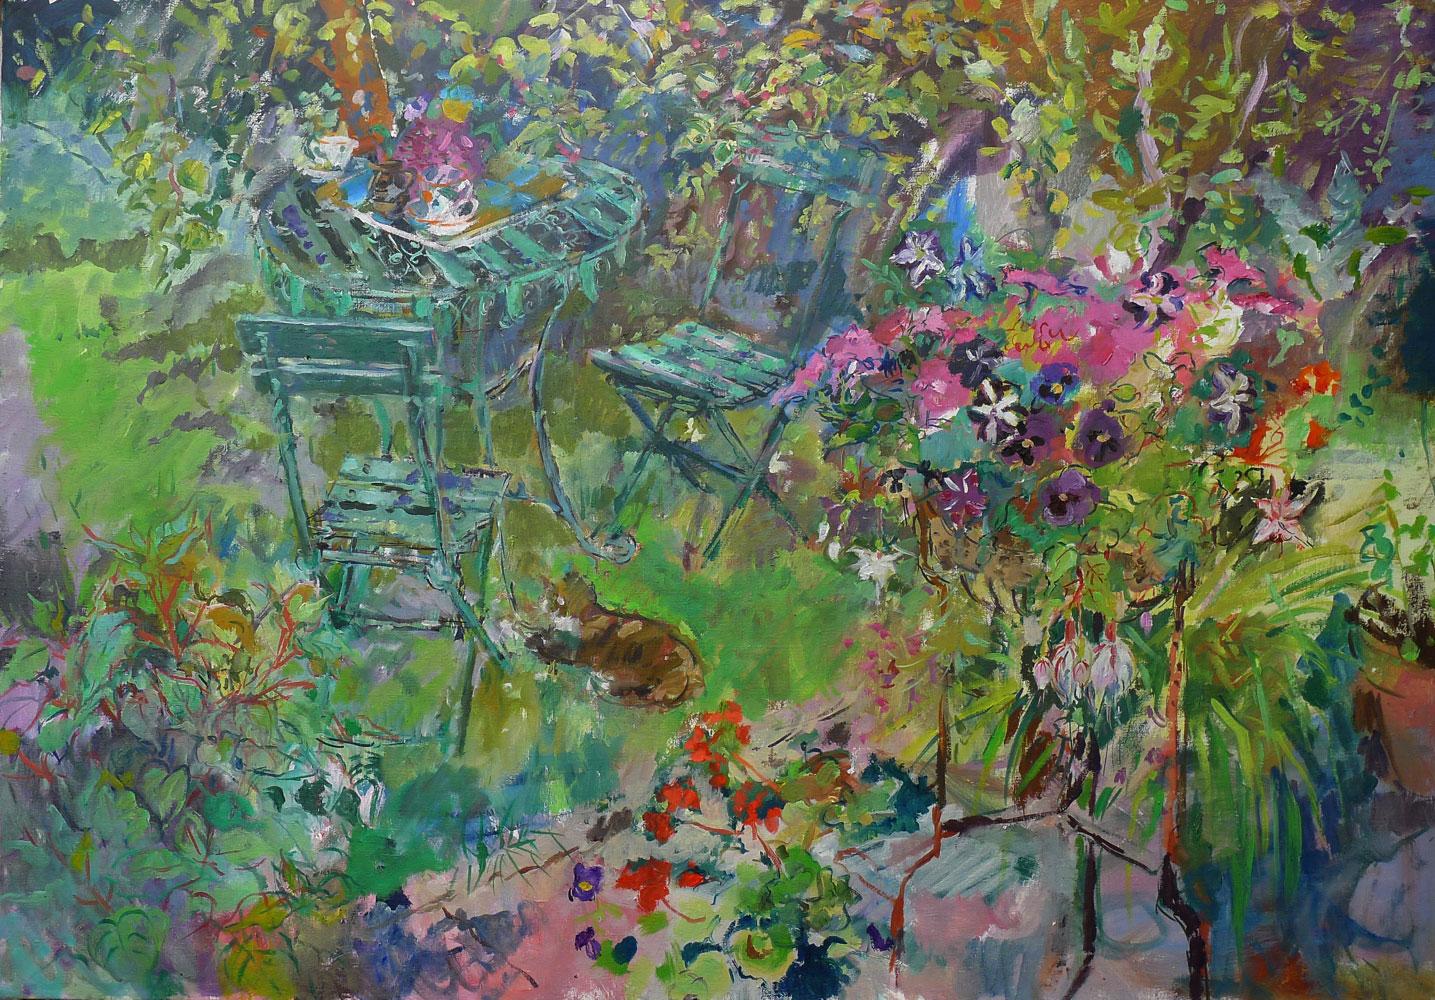 Garden-with-Jardiniere-(Richard-Baker)